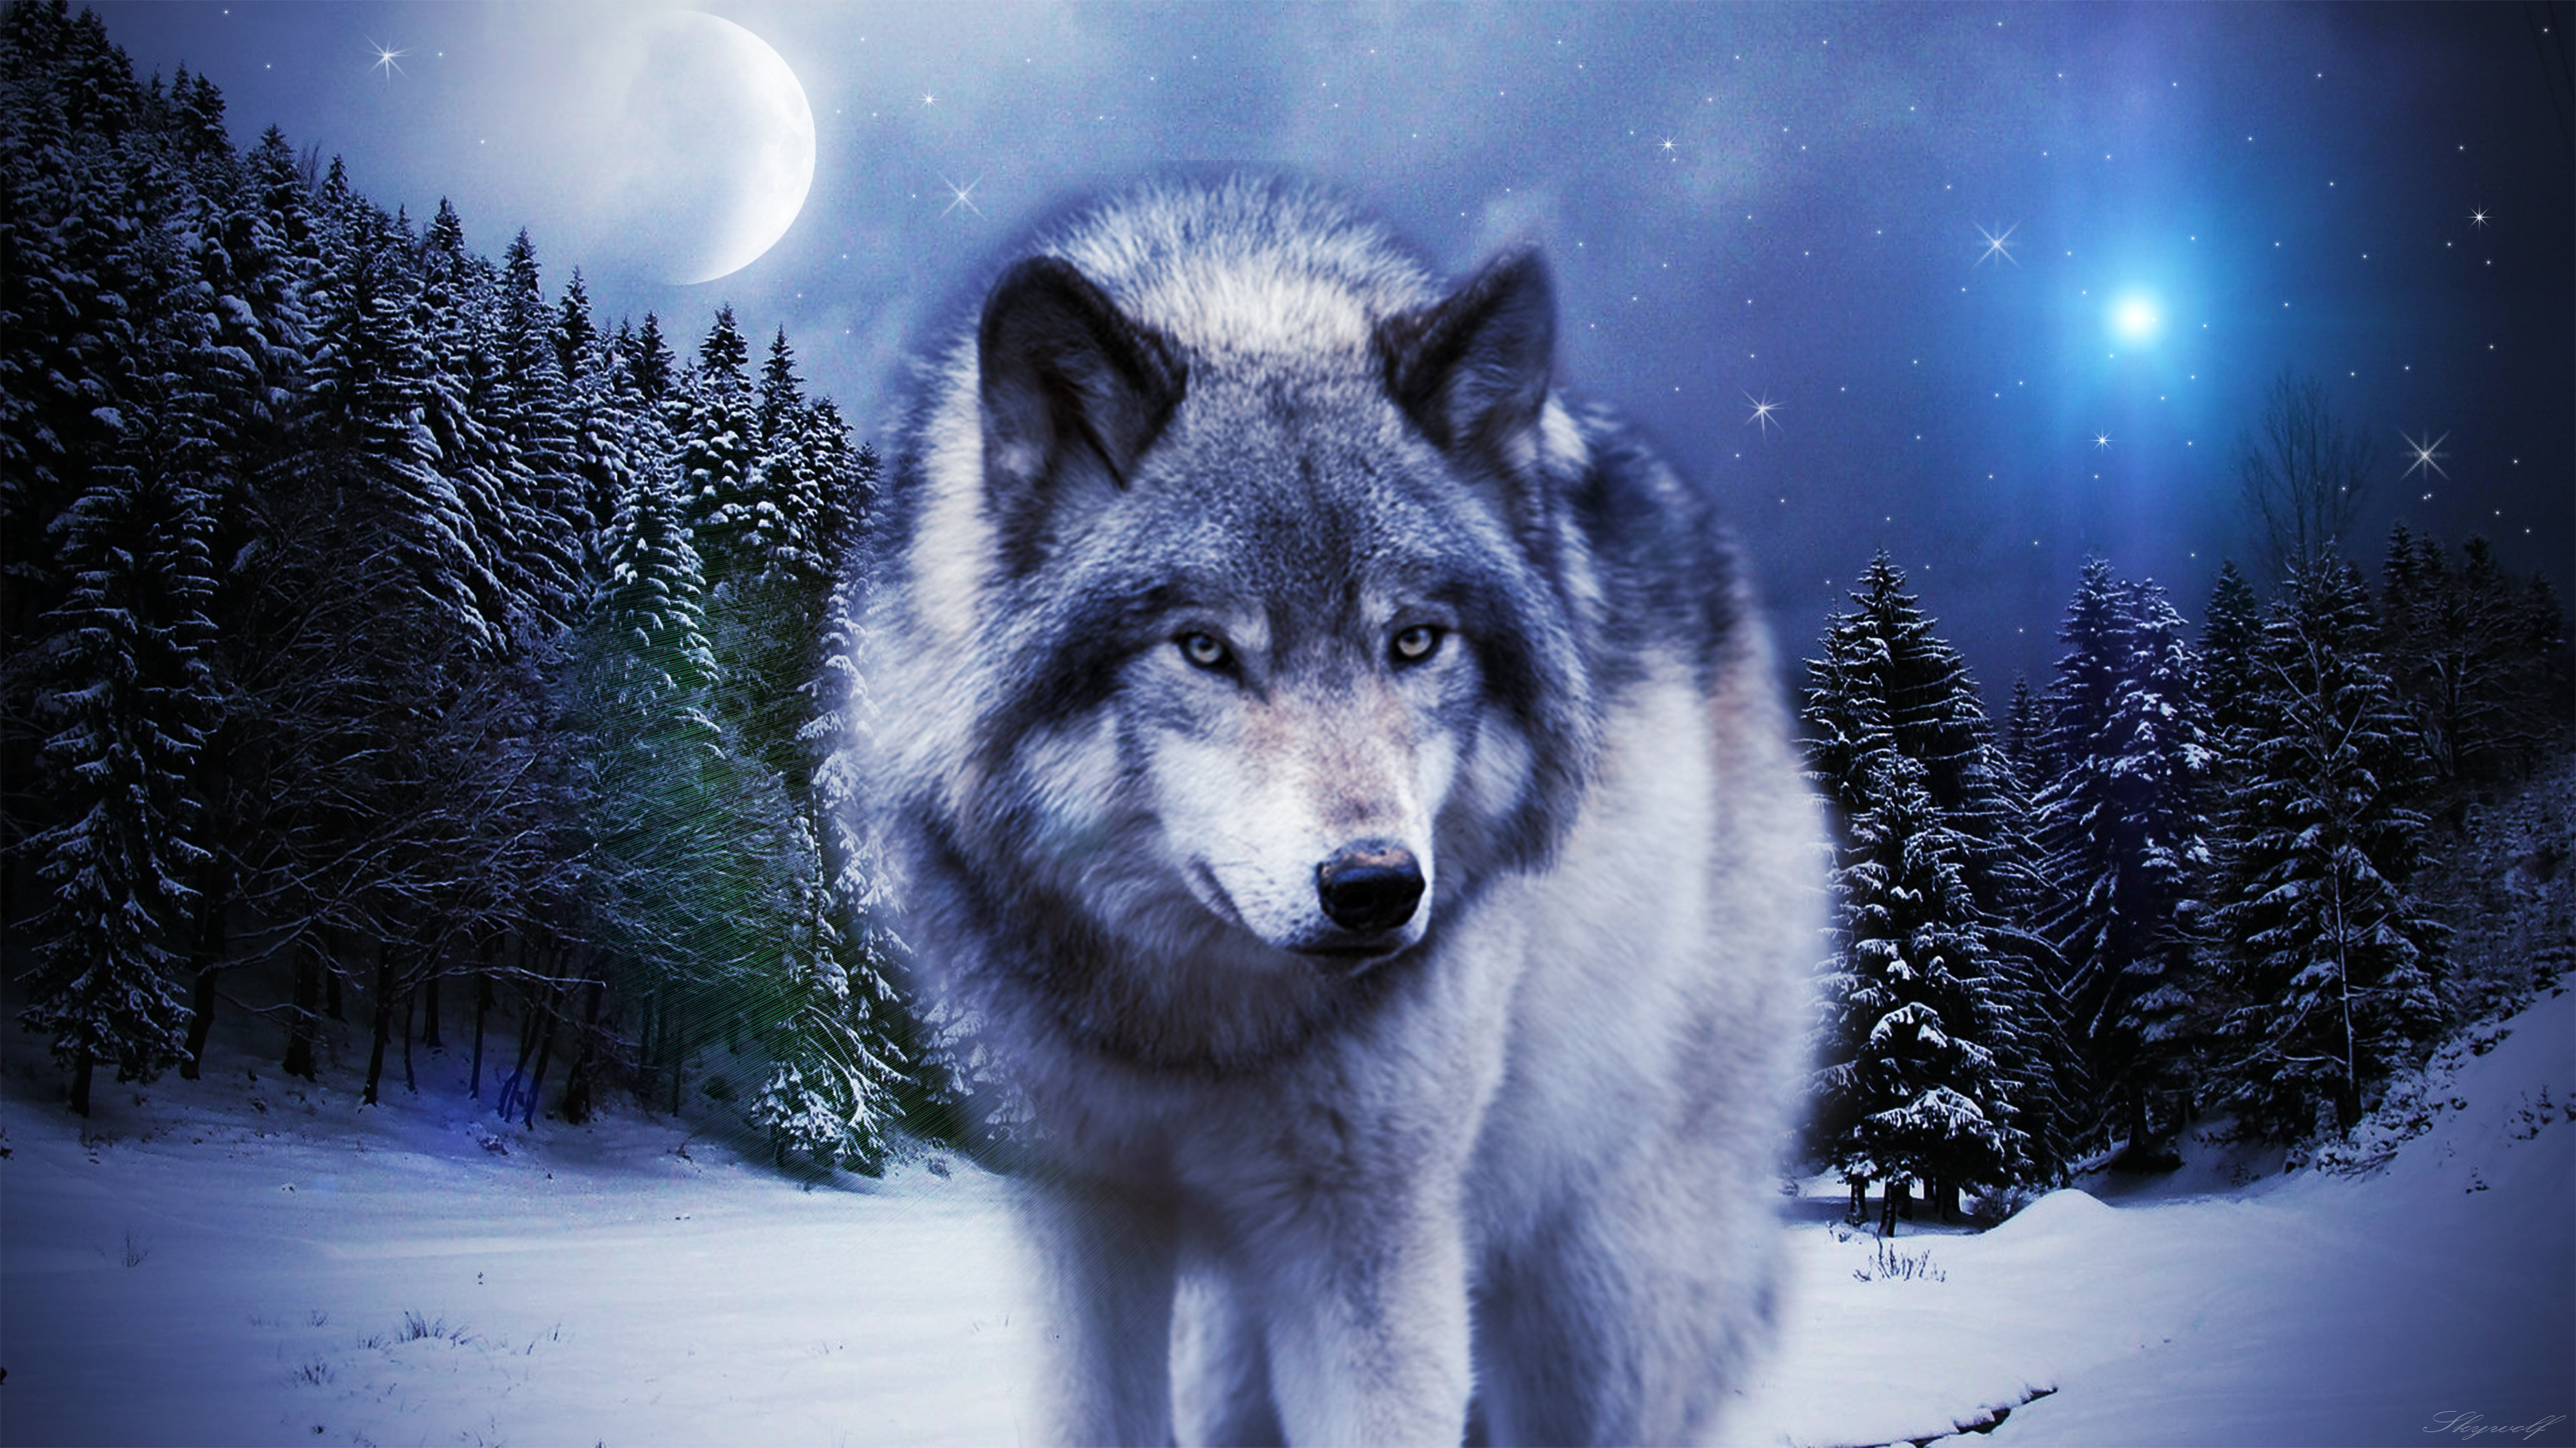 Macbook Animated Wallpaper Timber Wolf Wallpaper 183 ①